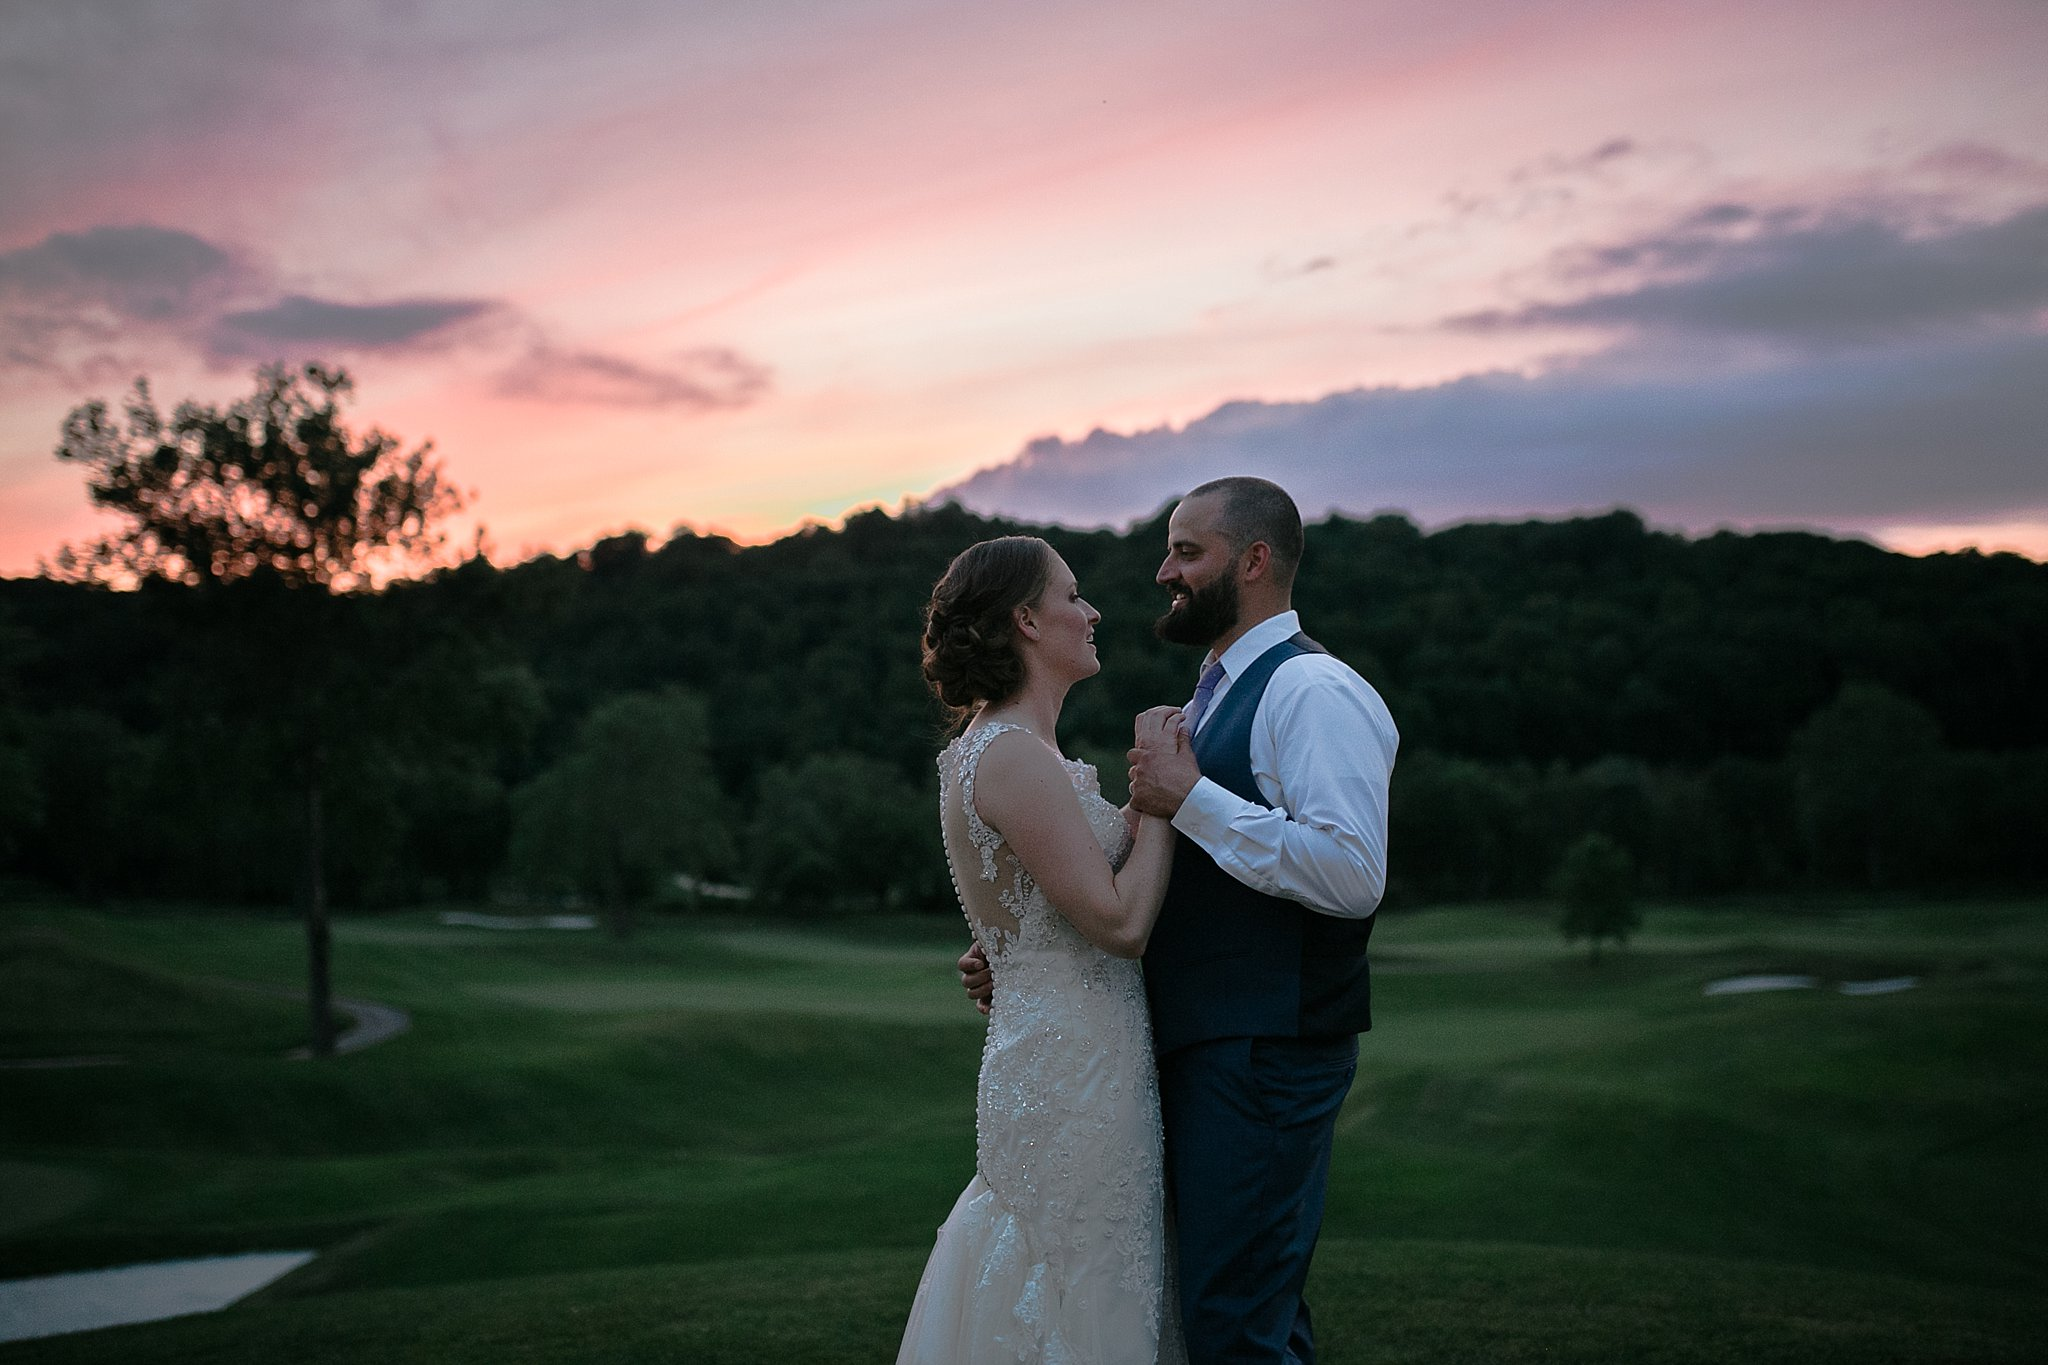 Hollow Brook Golf Club Cortlandt Manor NY Wedding Sweet Alice Photography June Wedding117.jpg